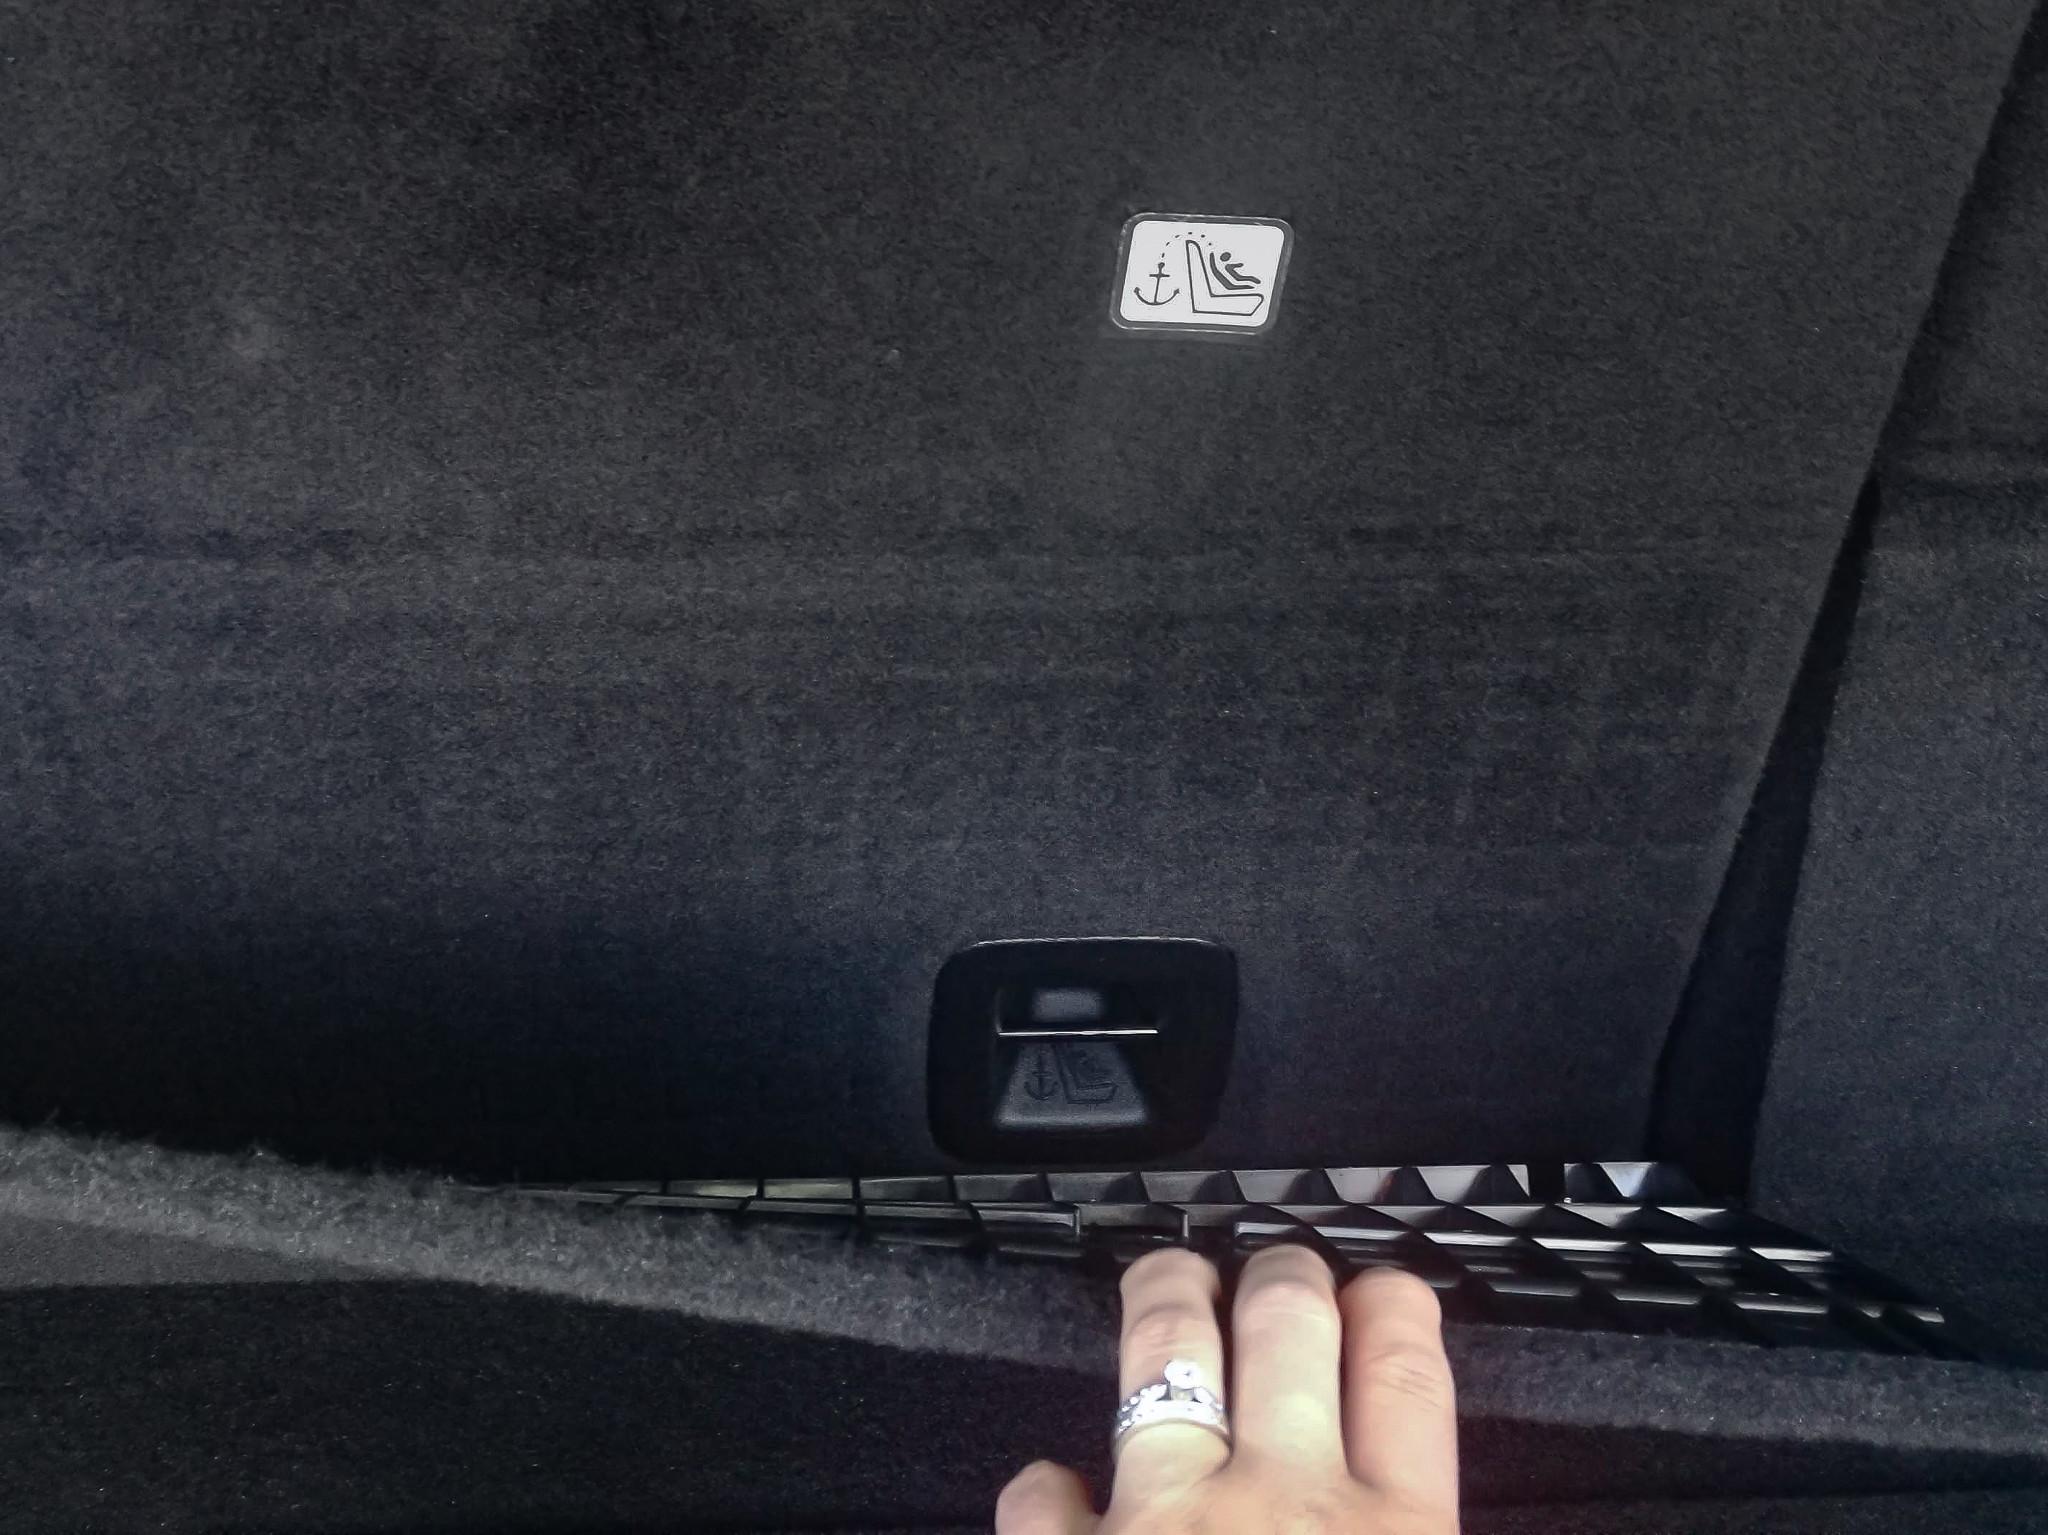 jeep-grand-cherokee-2019-01-csc--interior--latch.jpg